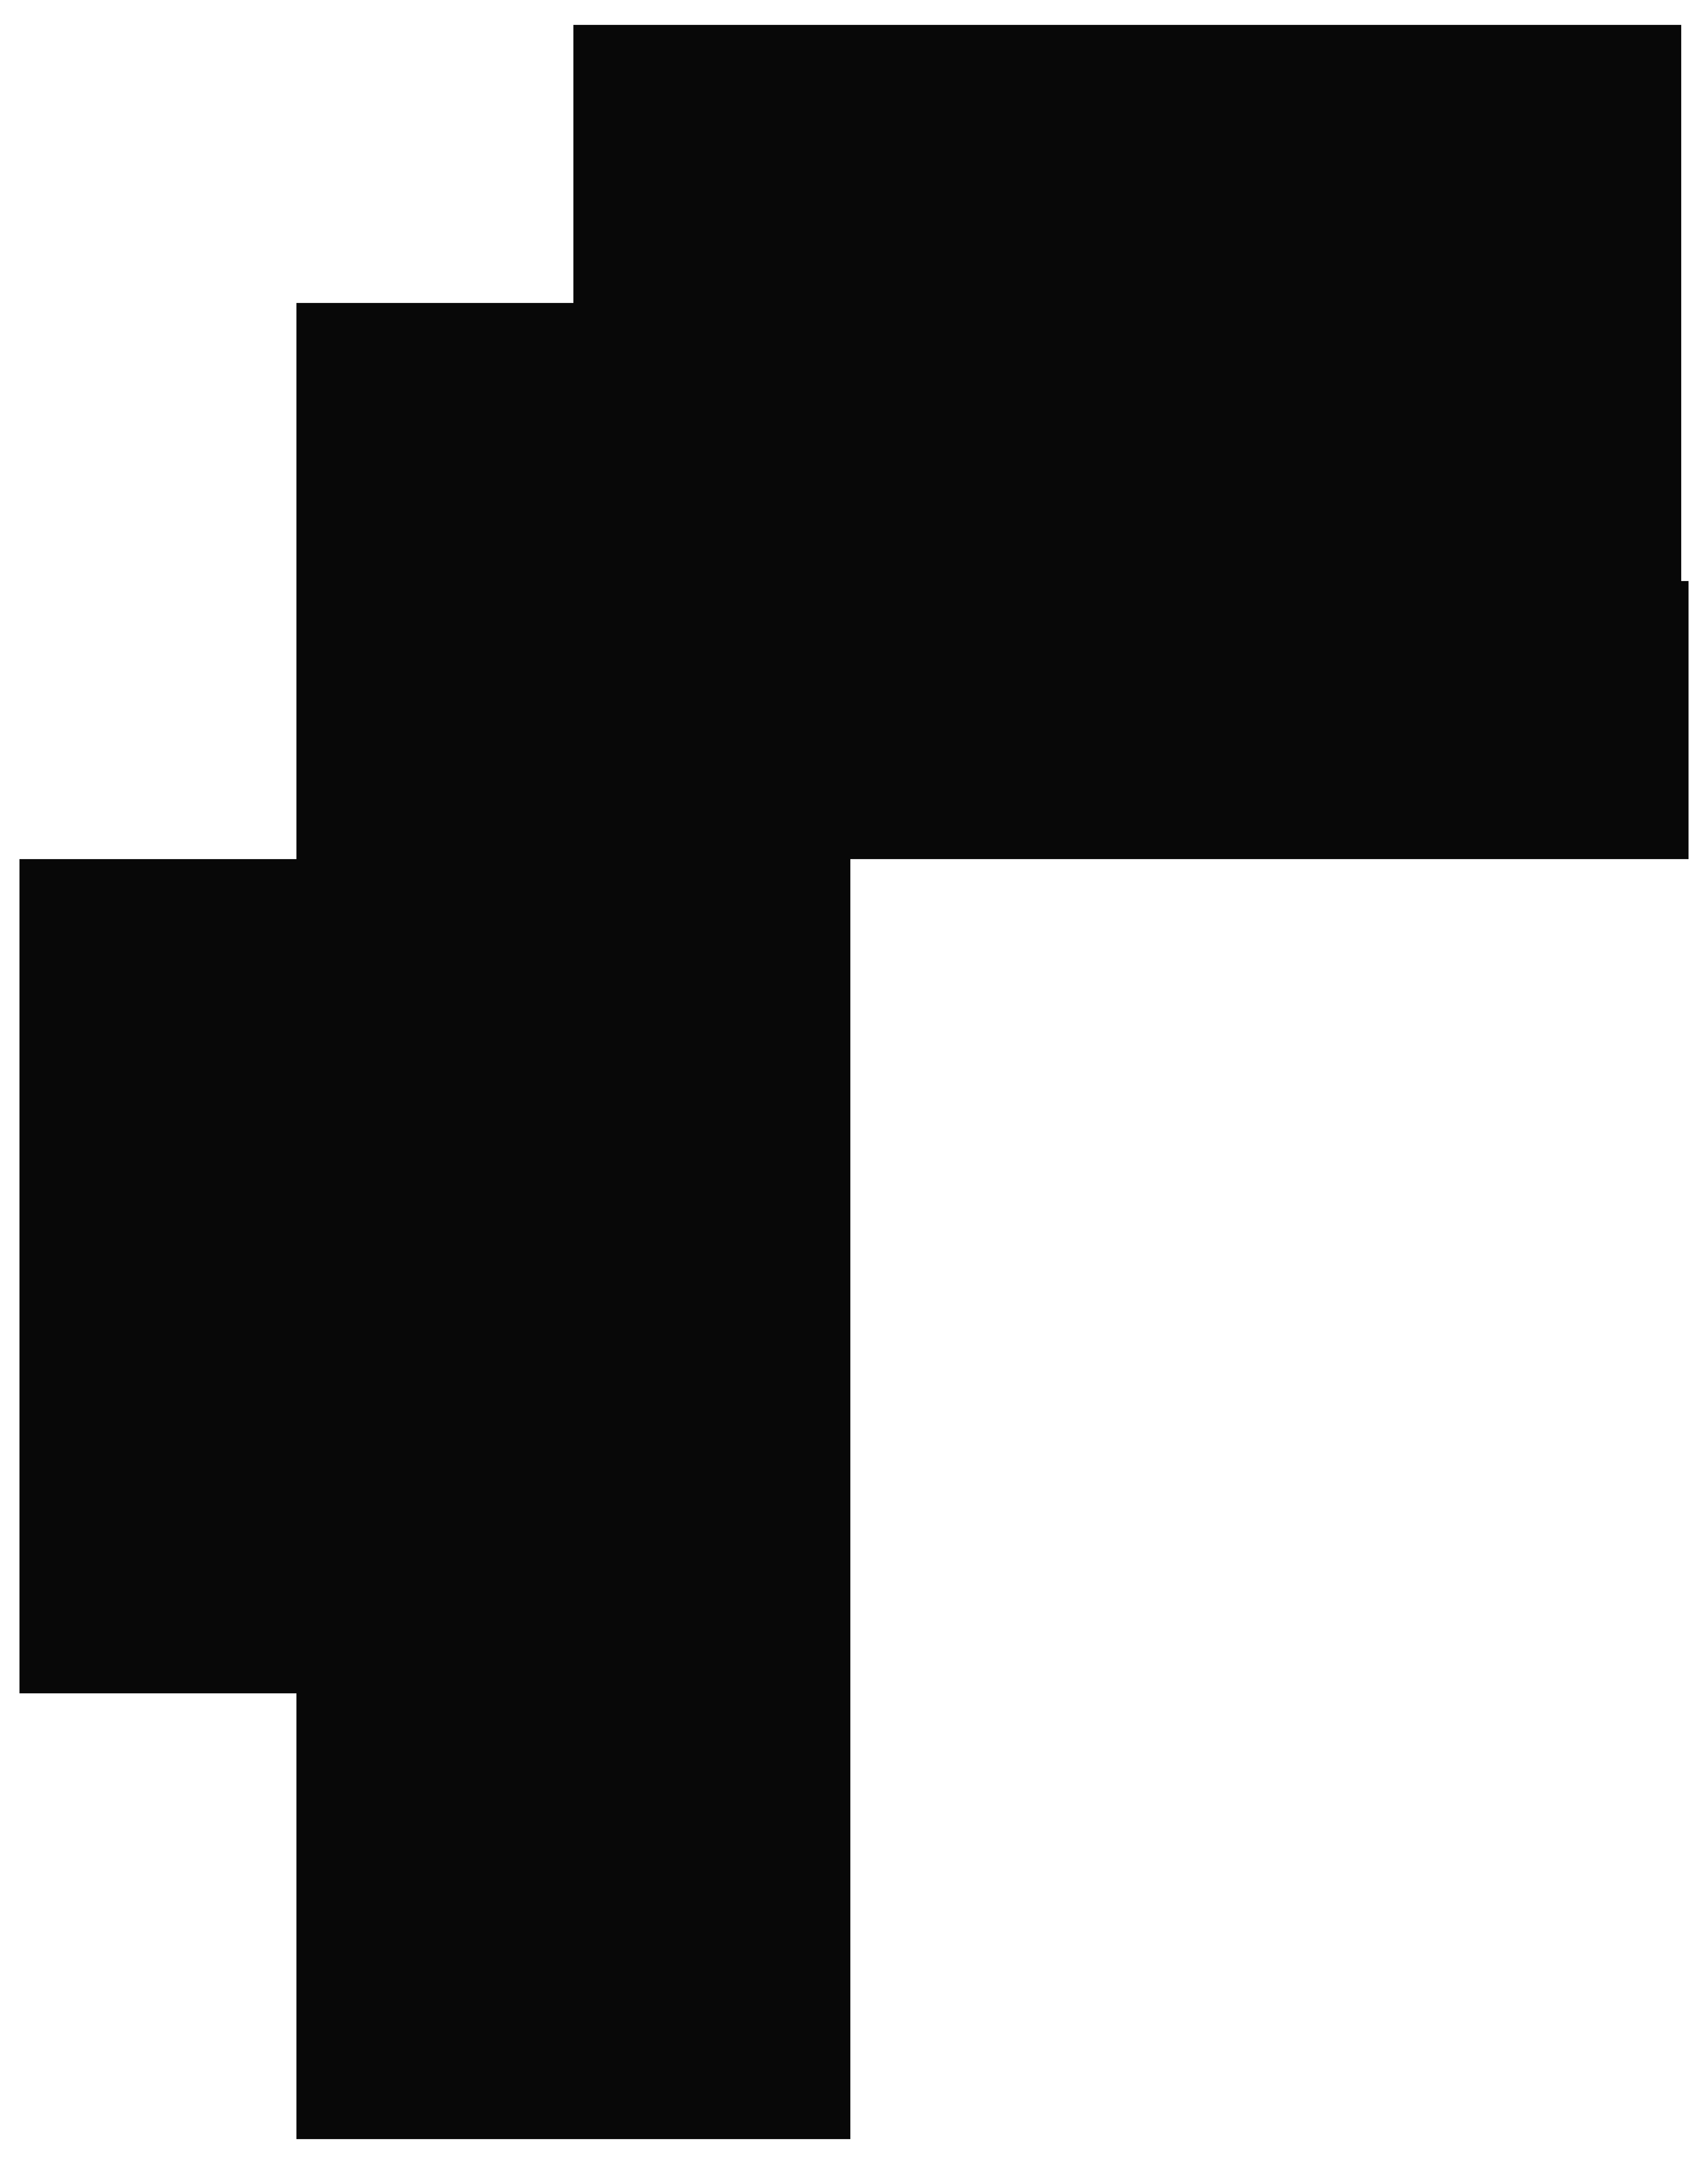 6315x8000 Romantic Couple Silhouettes Png Clip Art Image Silhouettes